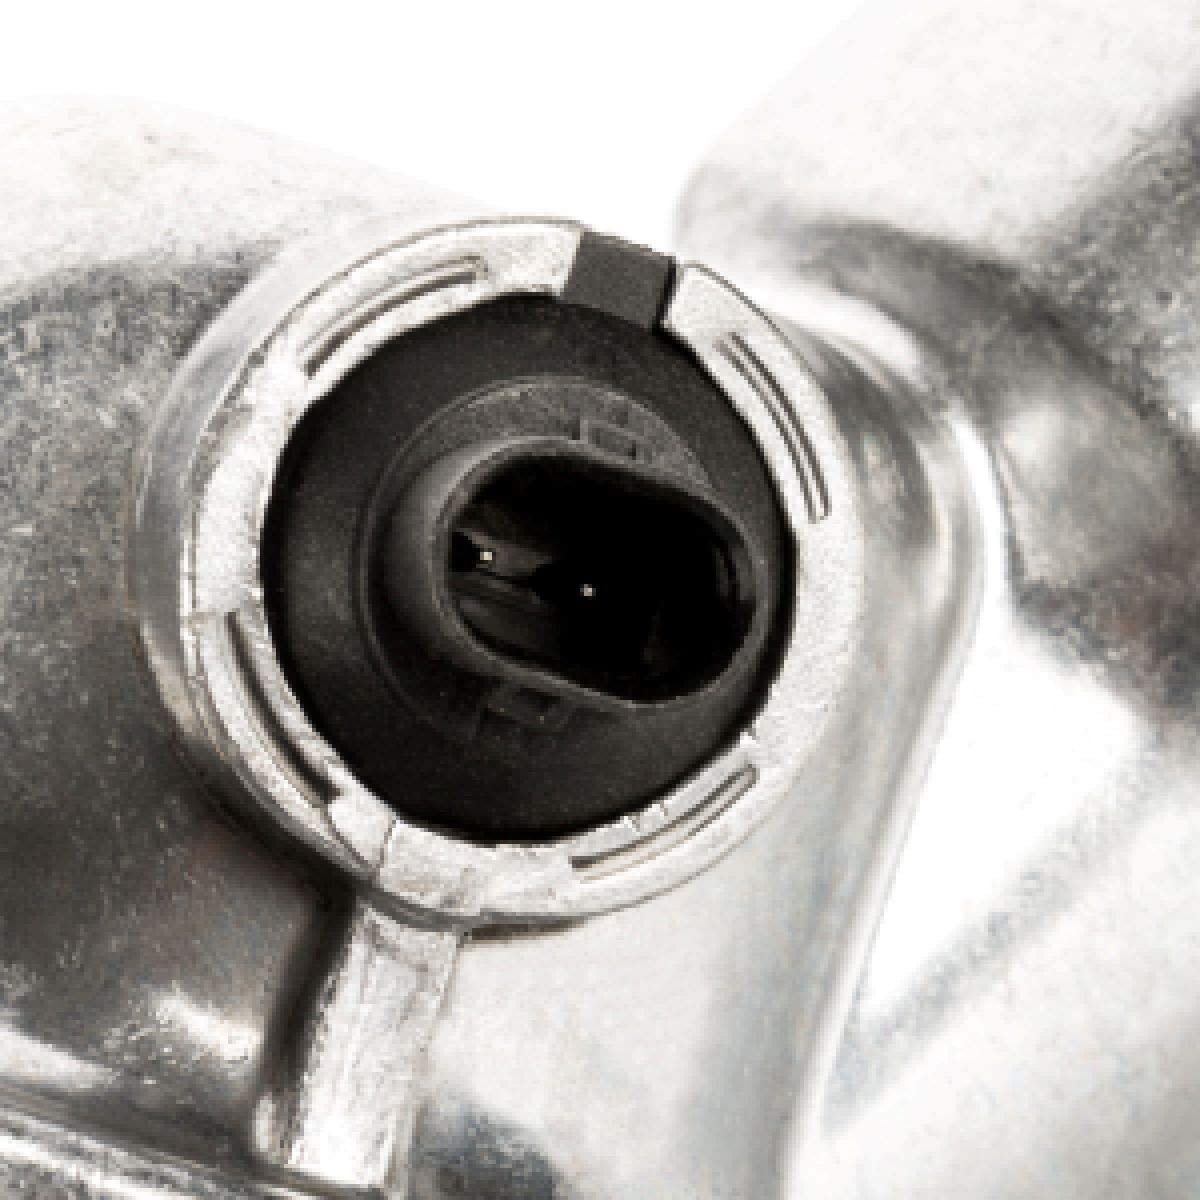 E-KLASSE LST Thermostatgeh/äuse K/ühlmittel Sensor 100 /°C mit Dichtung C